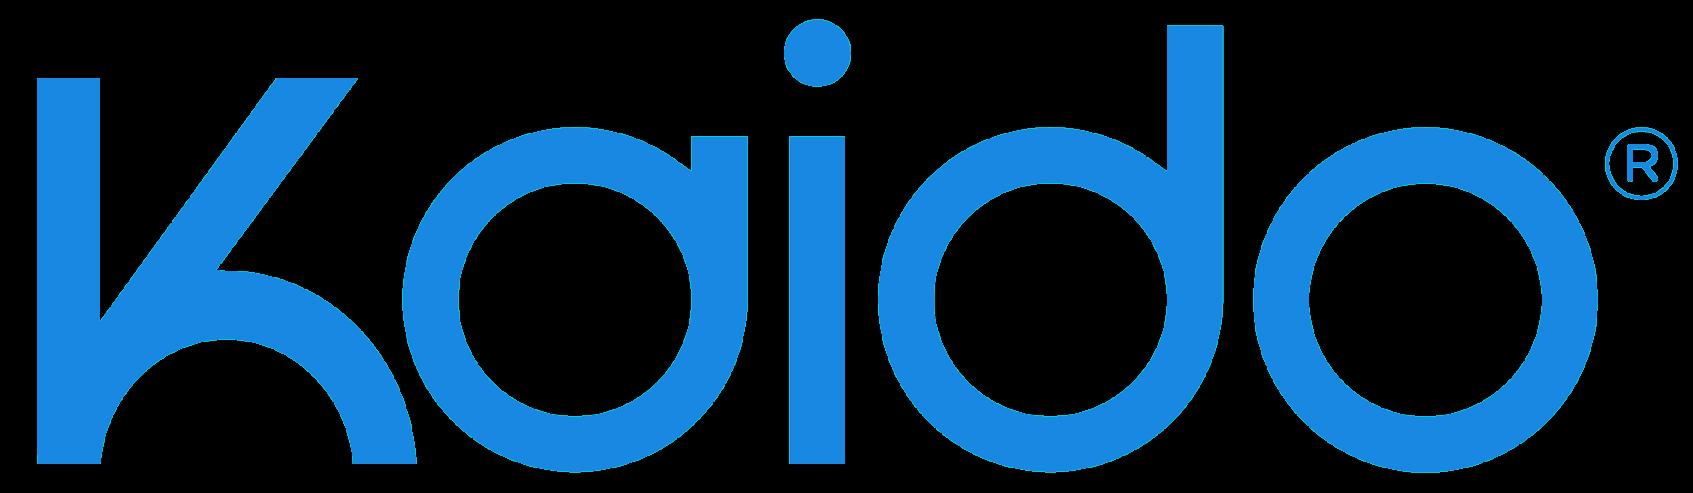 Kaido_logo_blue